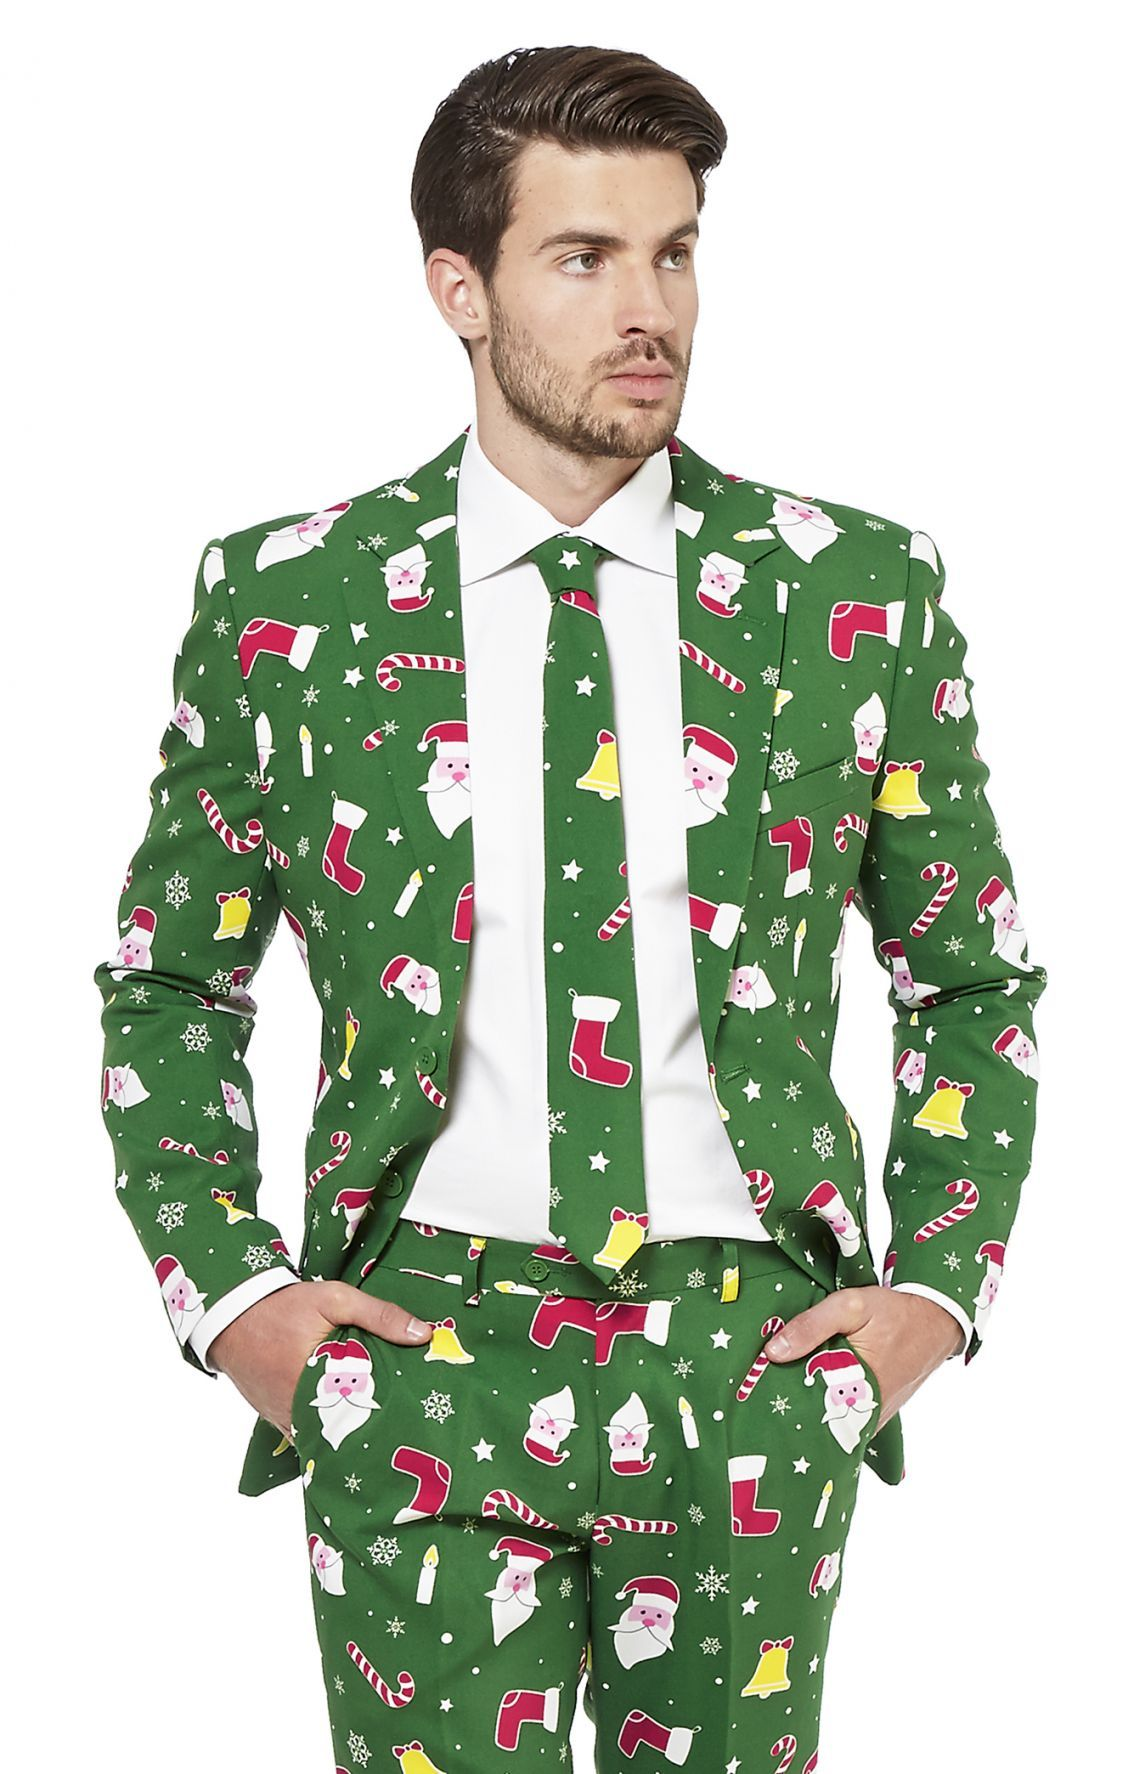 Crazy Christmas Suits